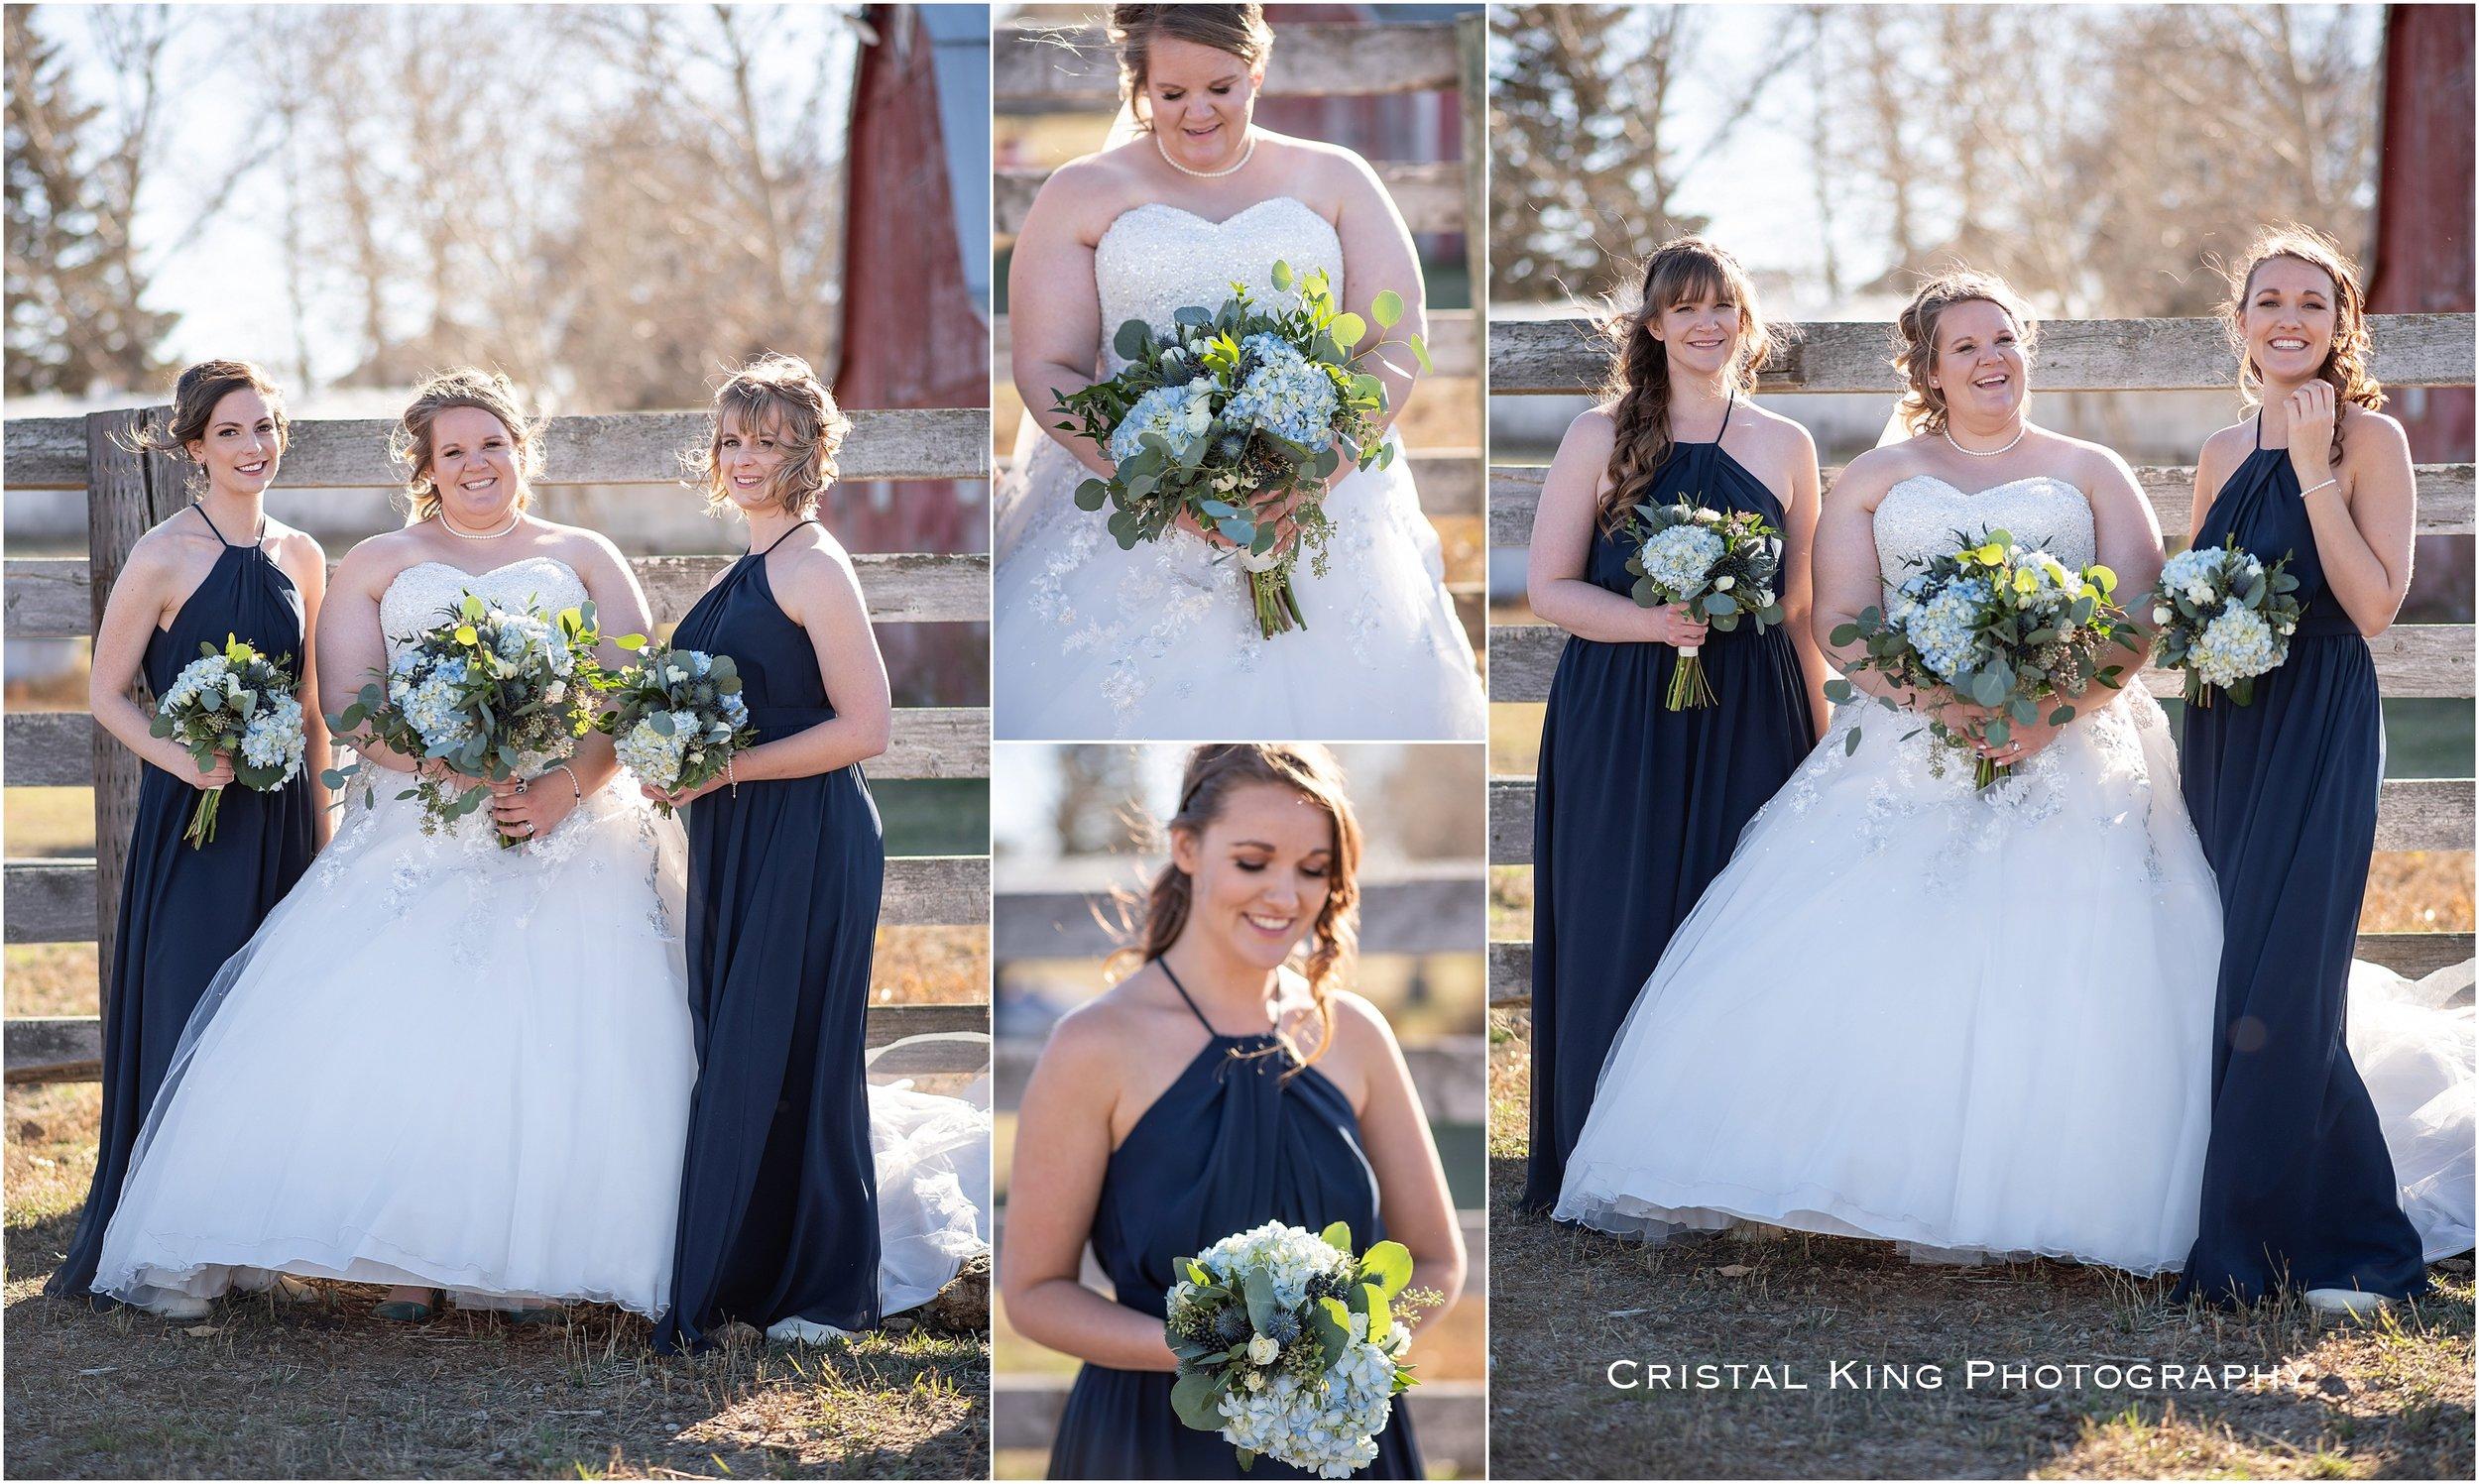 Tracy-Kyles-Wedding-91.jpg